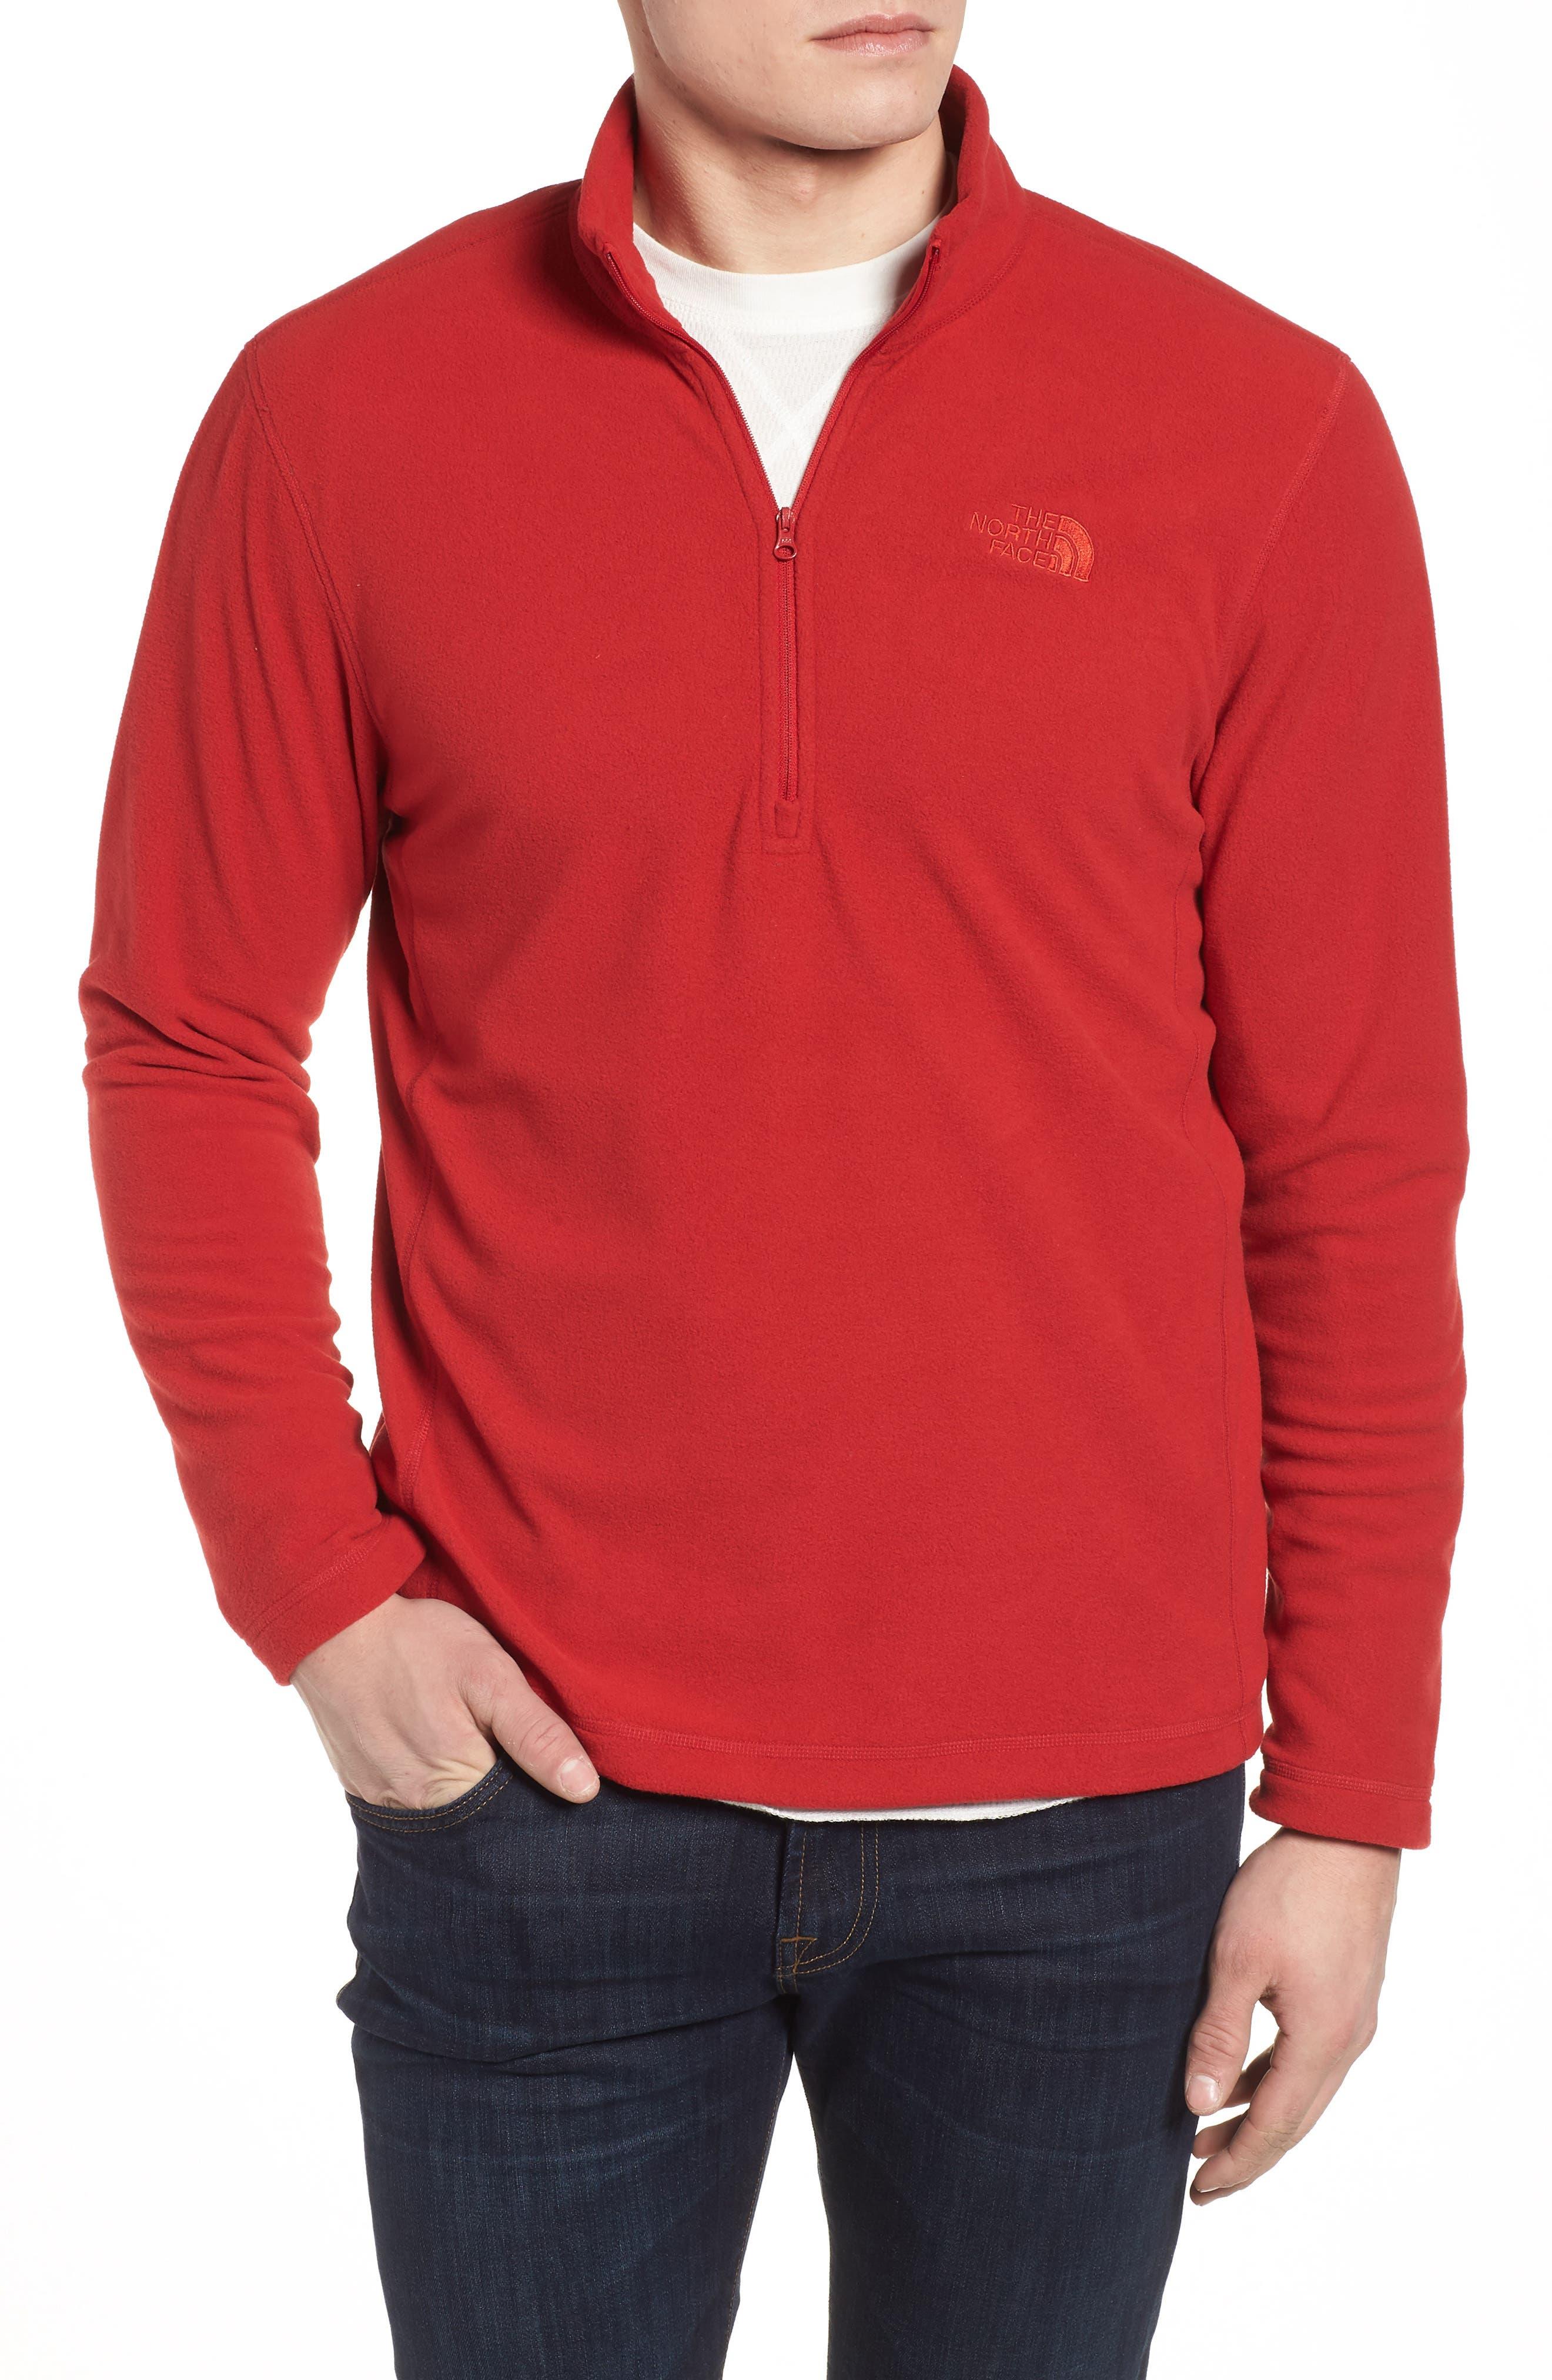 'TKA 100 Glacier' Quarter Zip Fleece Pullover,                             Main thumbnail 1, color,                             RAGE RED/ RAGE RED